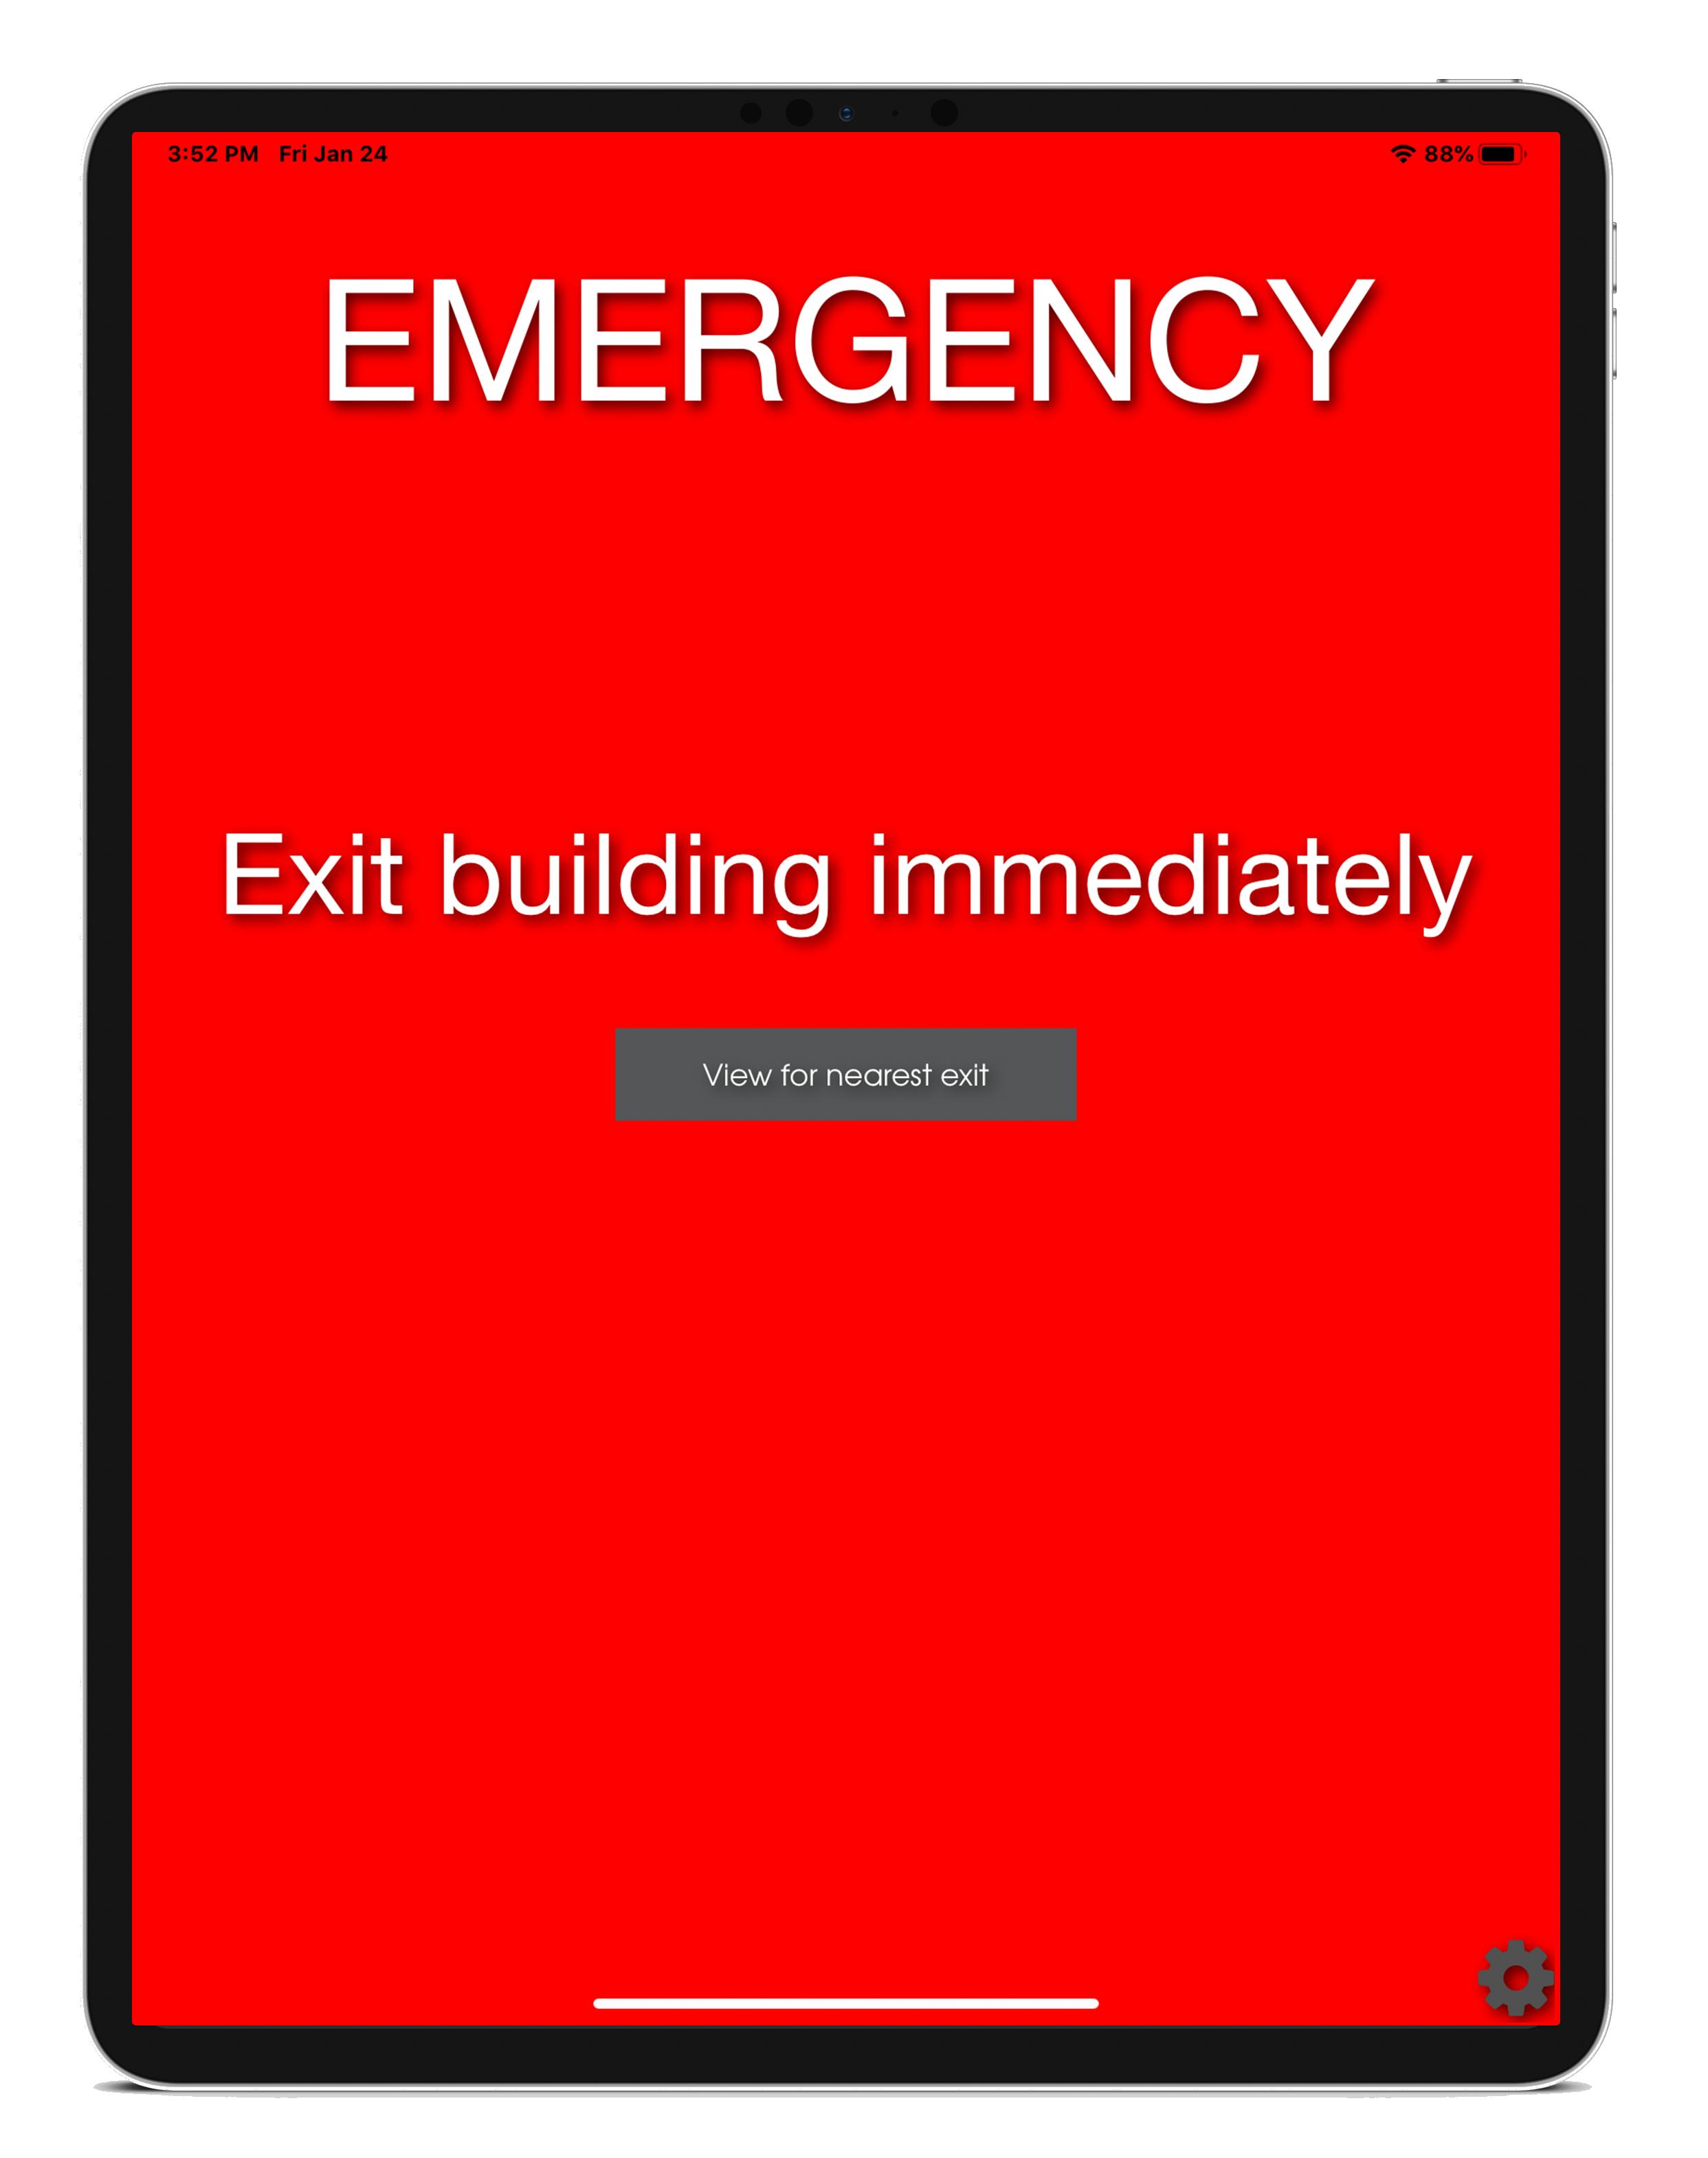 ipad check-in kiosk emergency mode